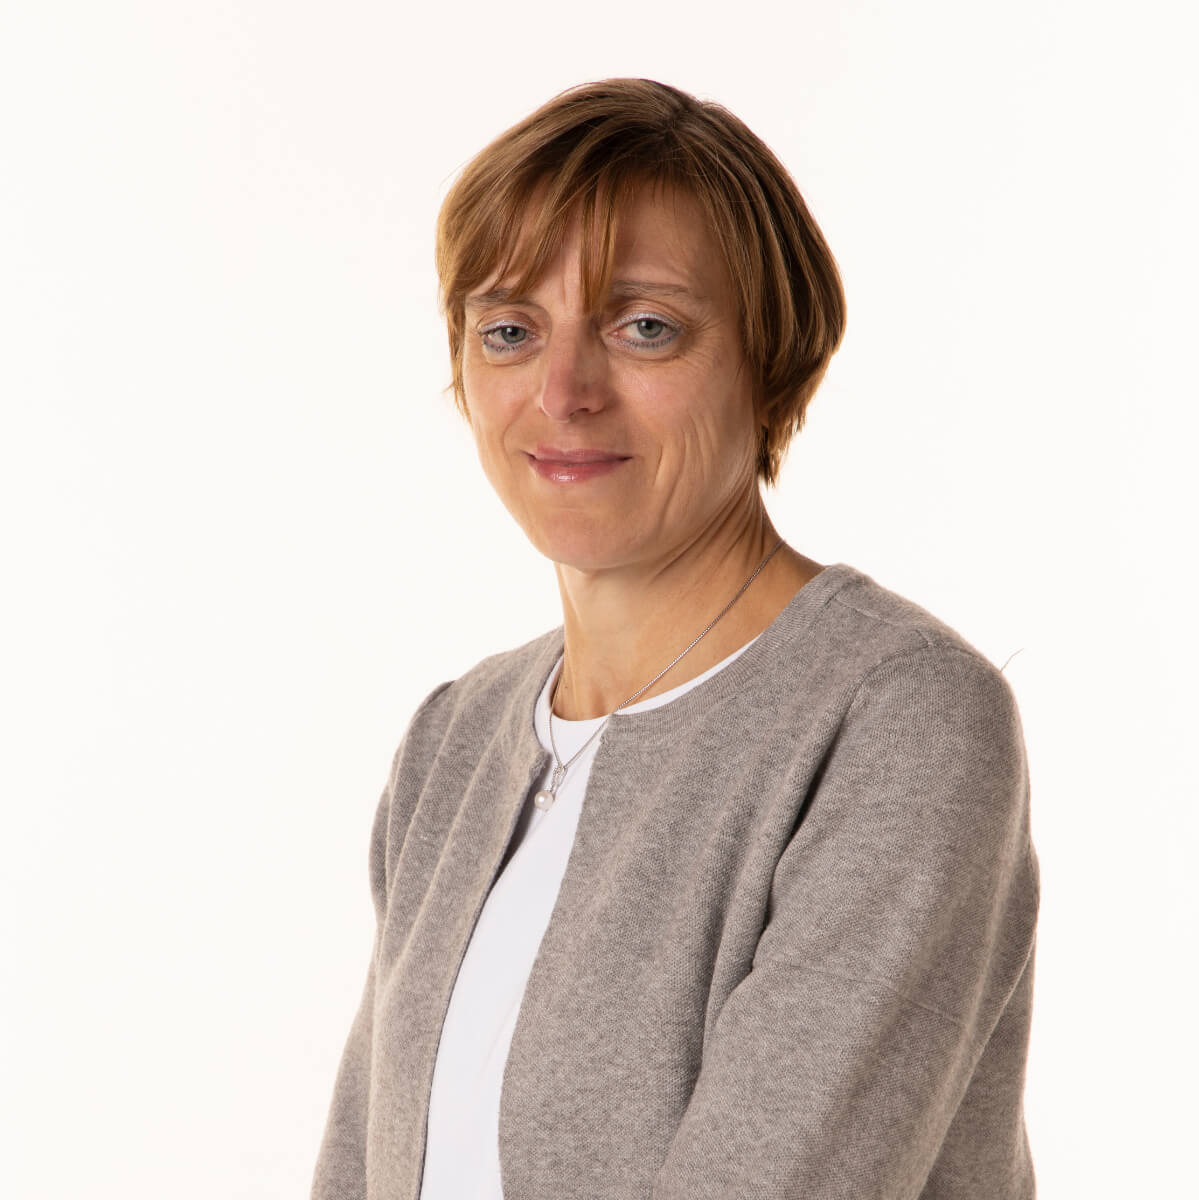 Johanna Devos